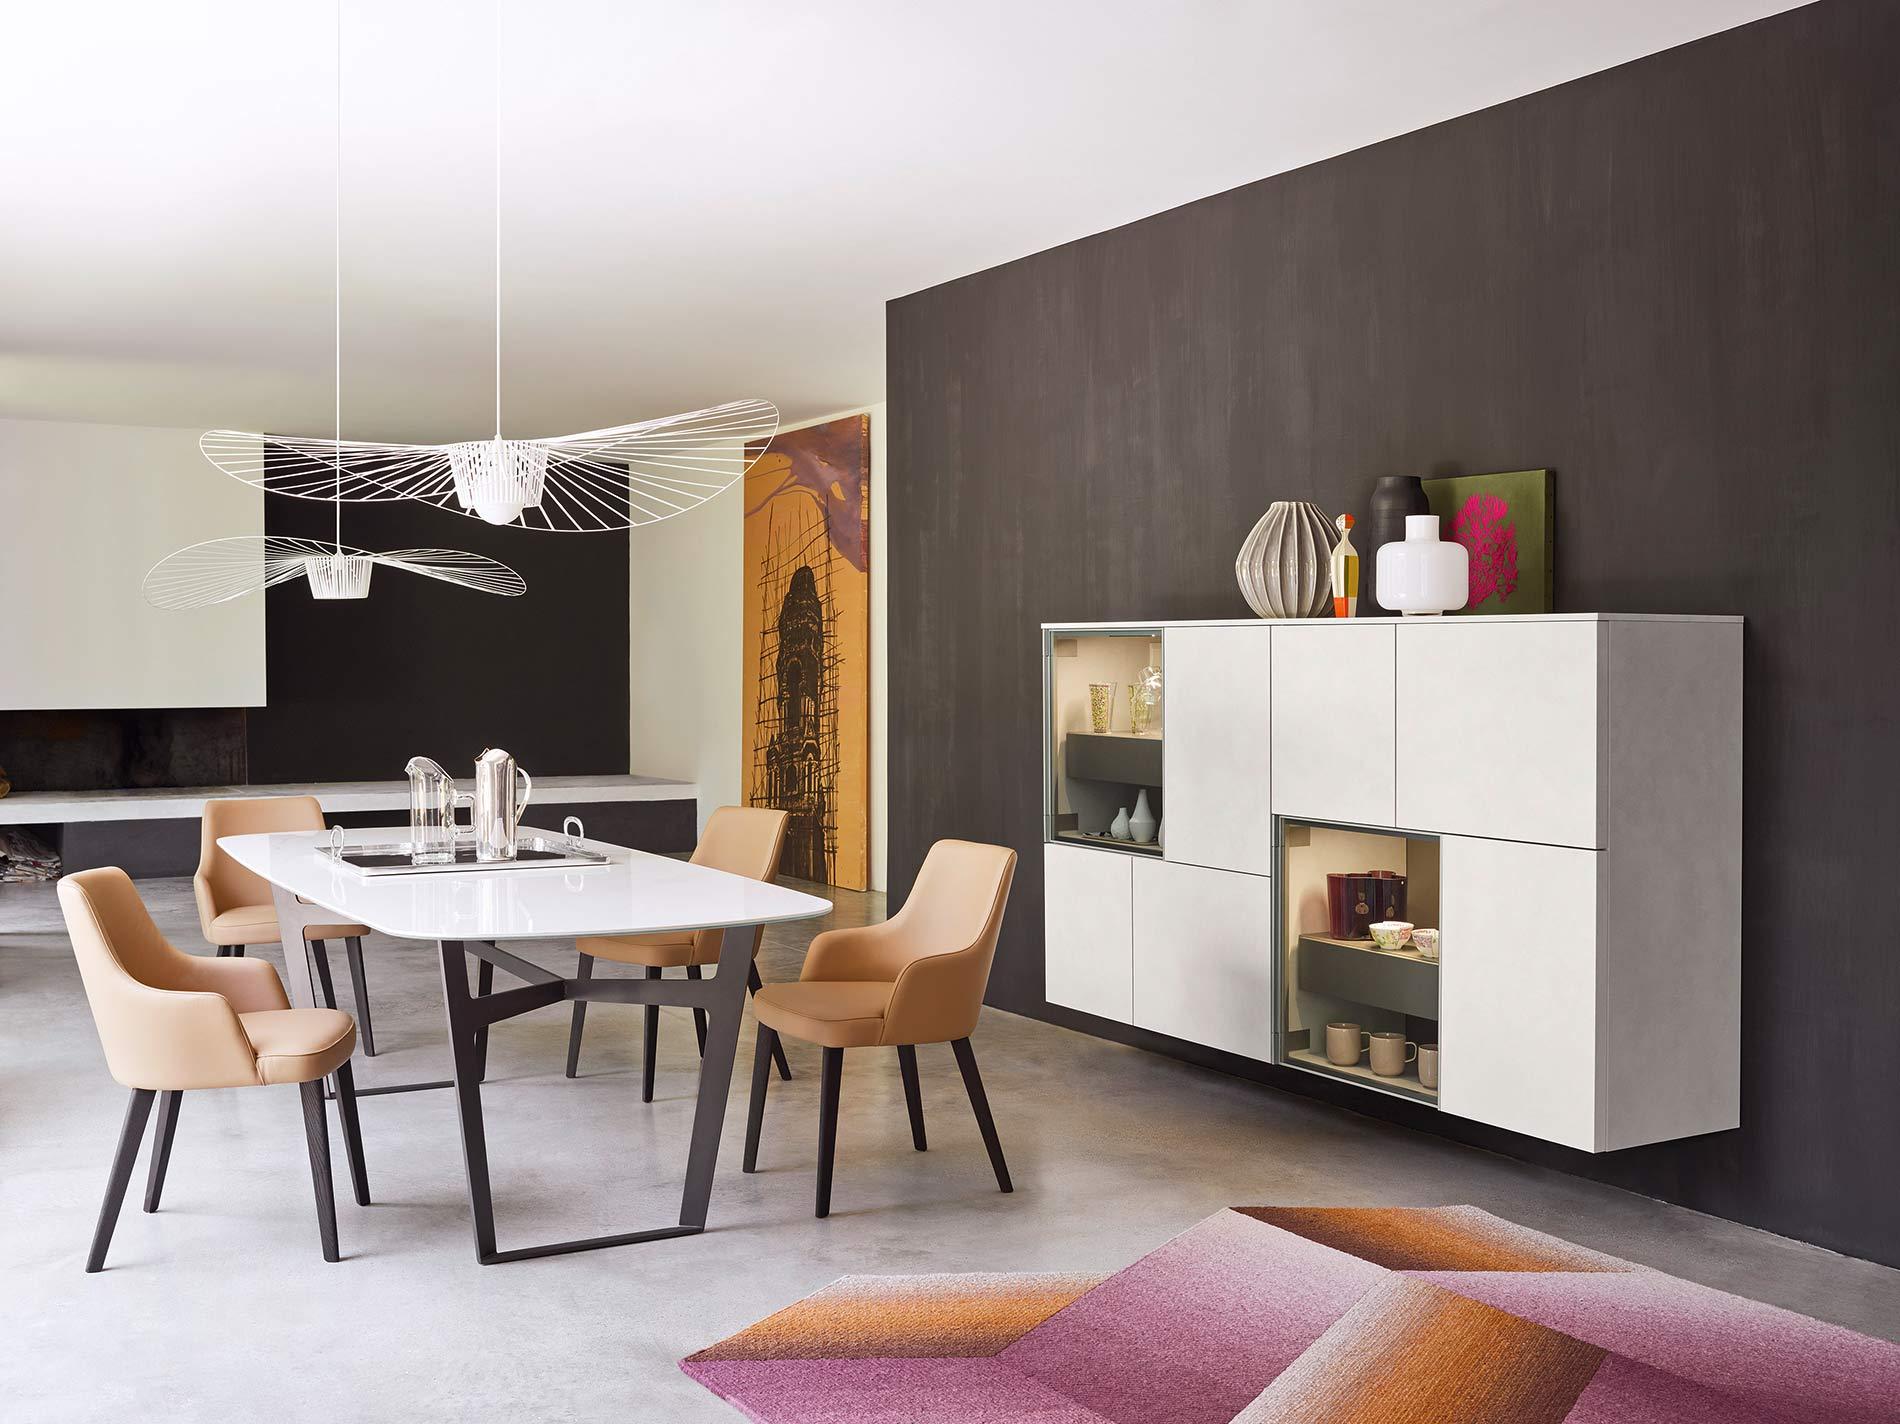 sideboard esszimmer sideboard calpe hochglanz sideboard wei schn sideboard tiwegus in wei. Black Bedroom Furniture Sets. Home Design Ideas